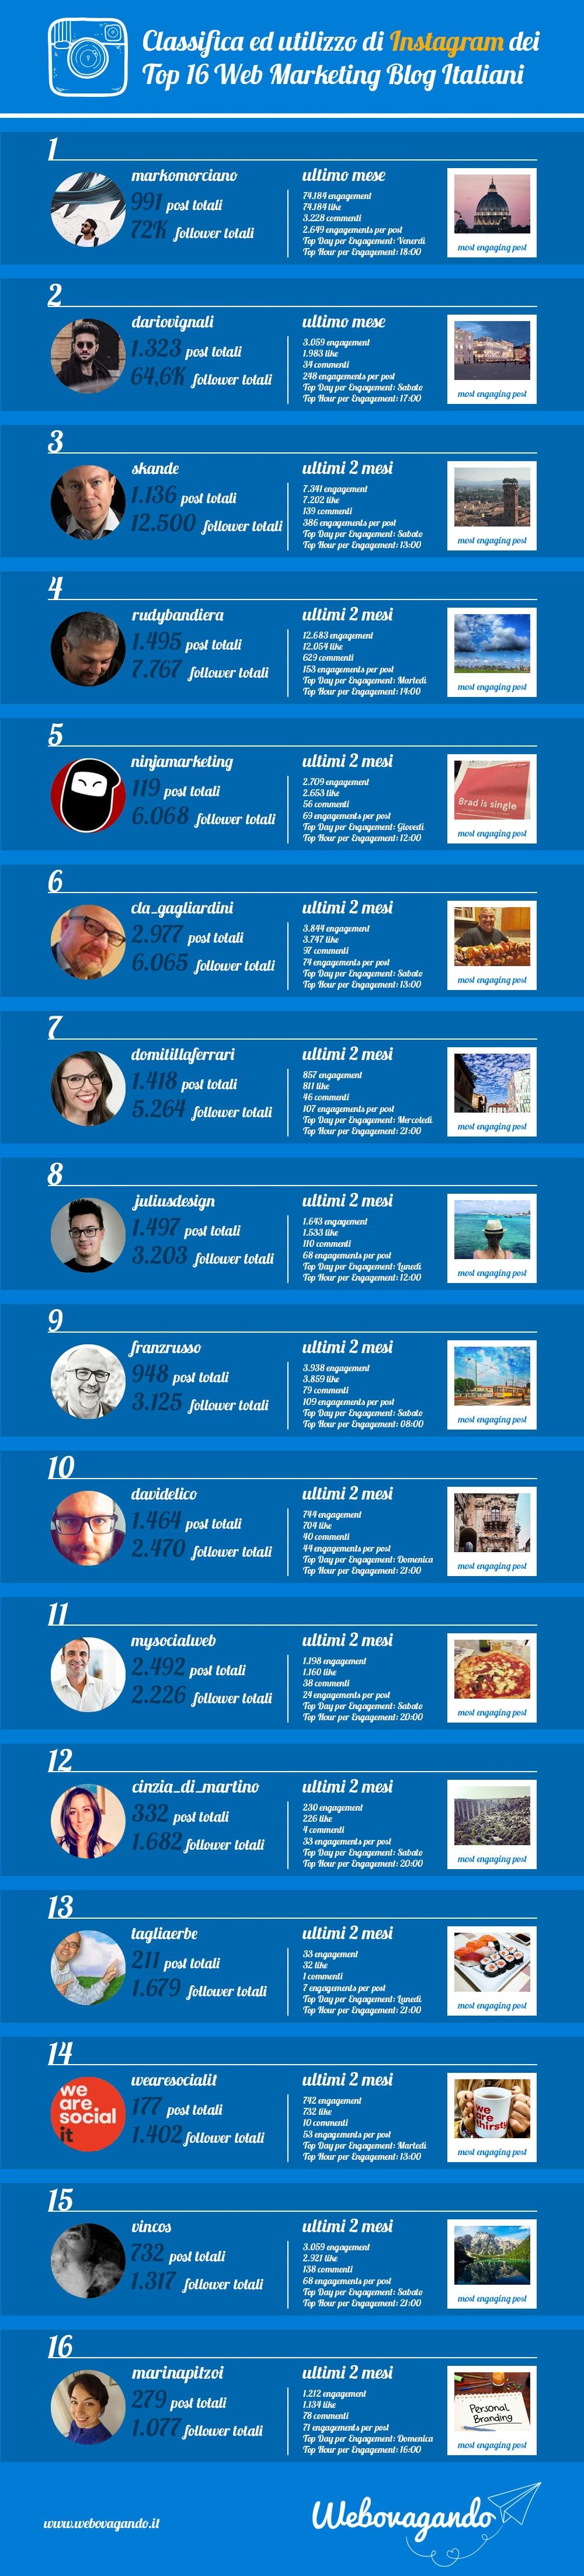 instagram_top_16_web_marketing_blog